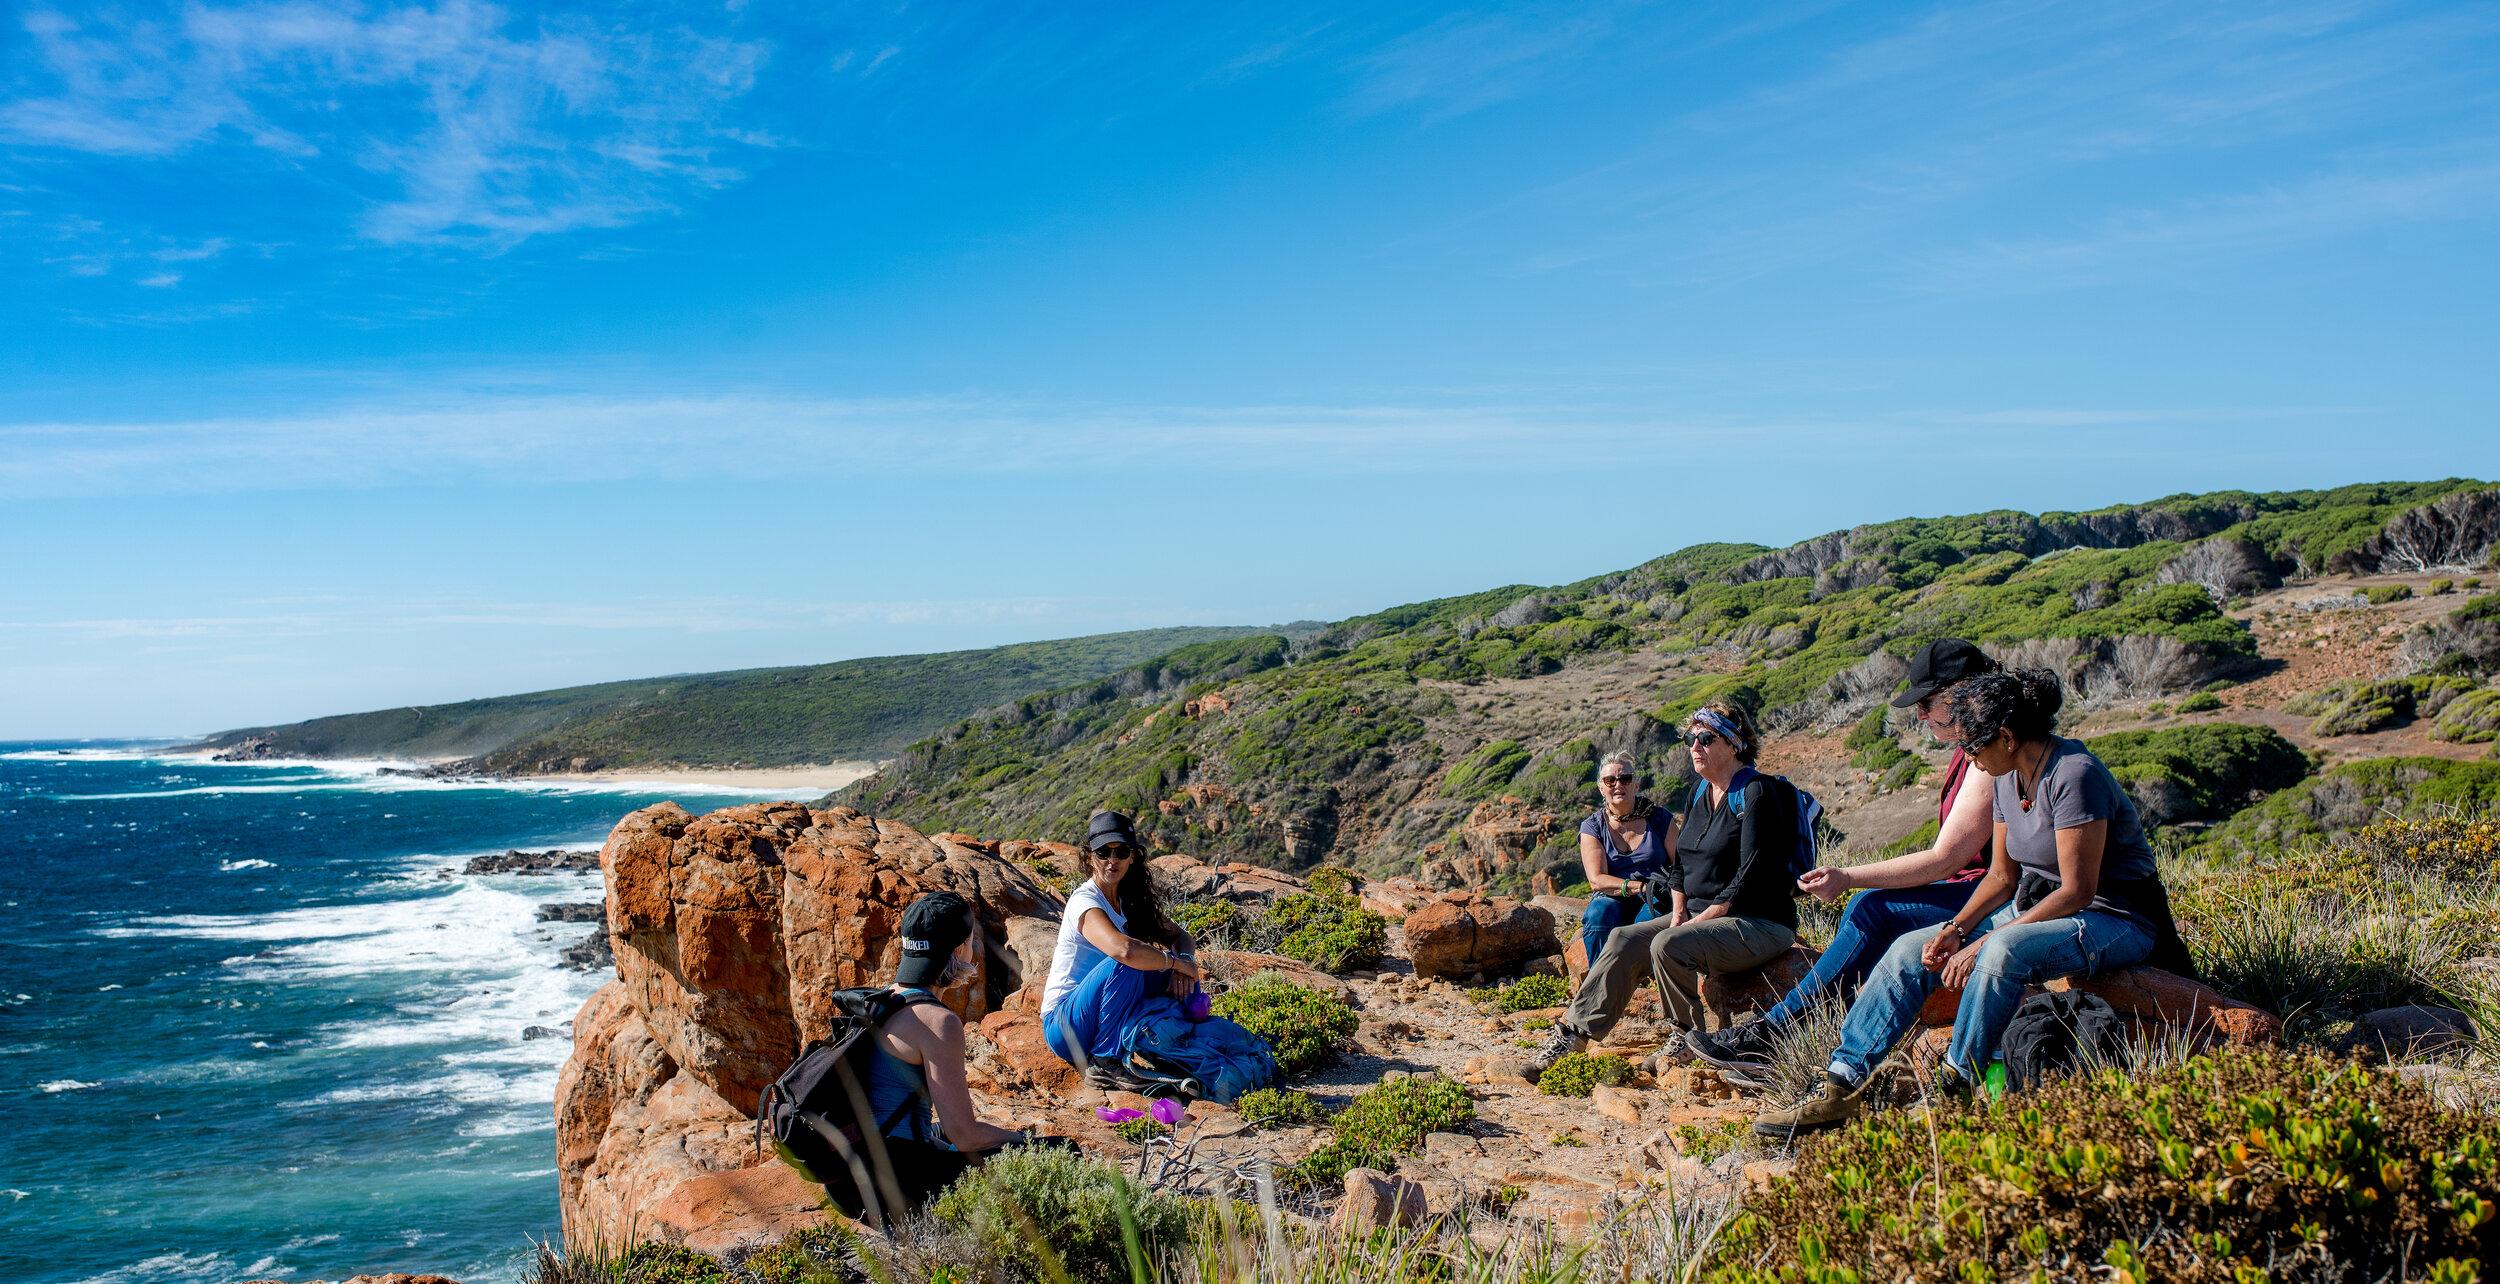 On the Cape to Cape - Western Australia